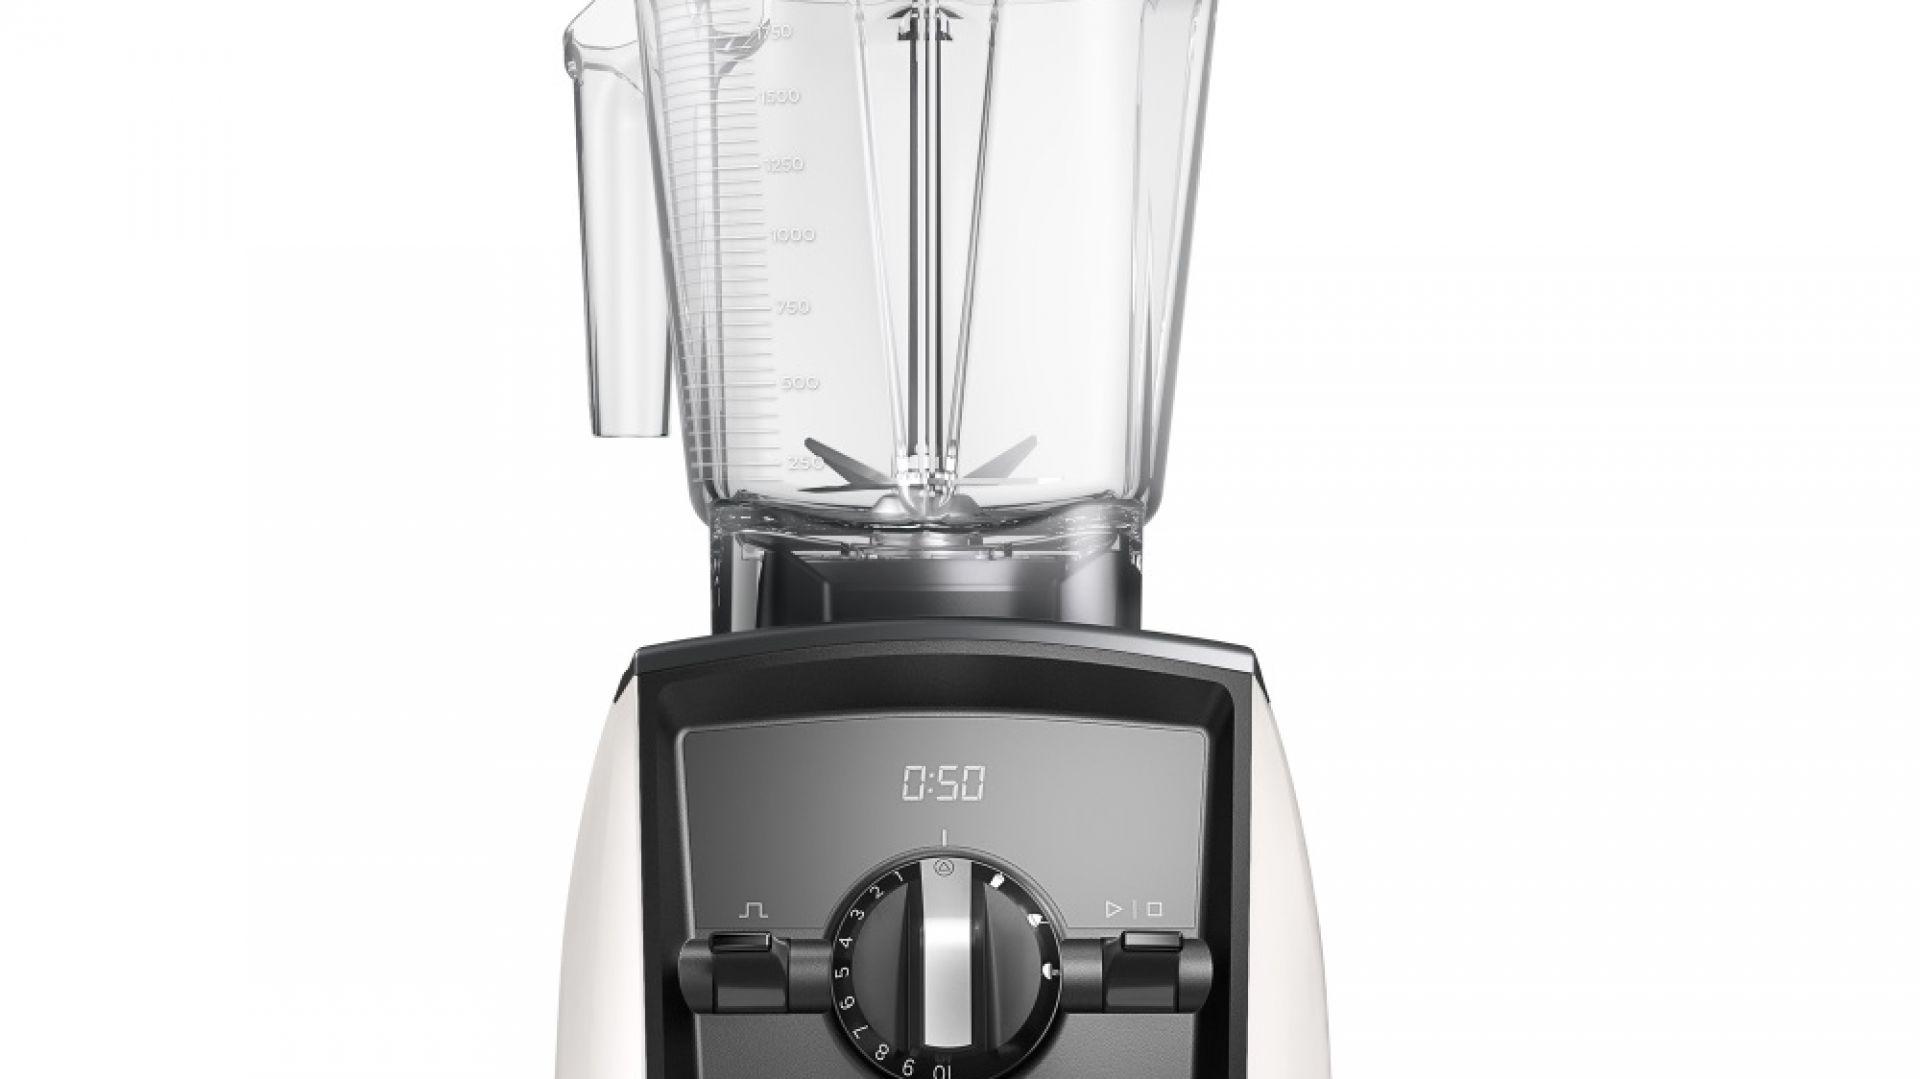 Nowoczesny blender, model Ascent Series. Fot. Vitamix